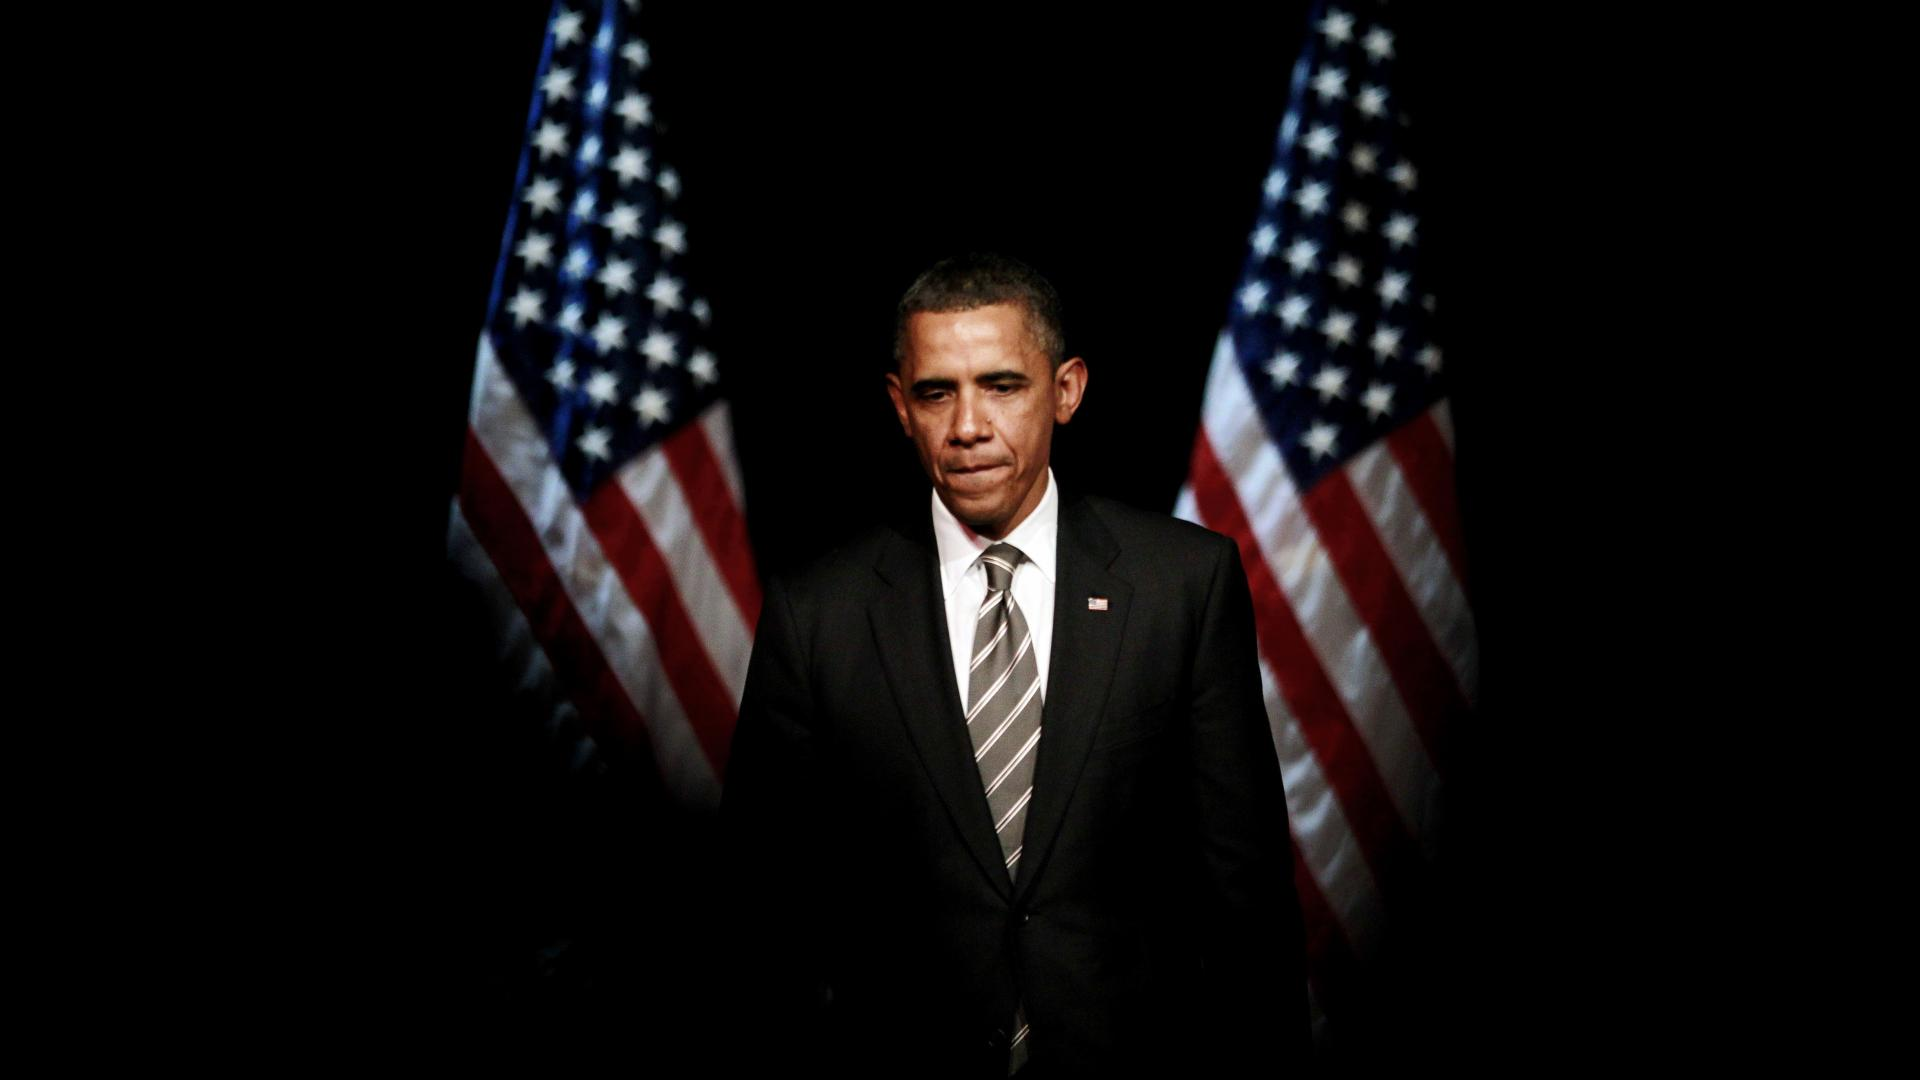 Barack-Obama-Presiden-USA-Wallpapers